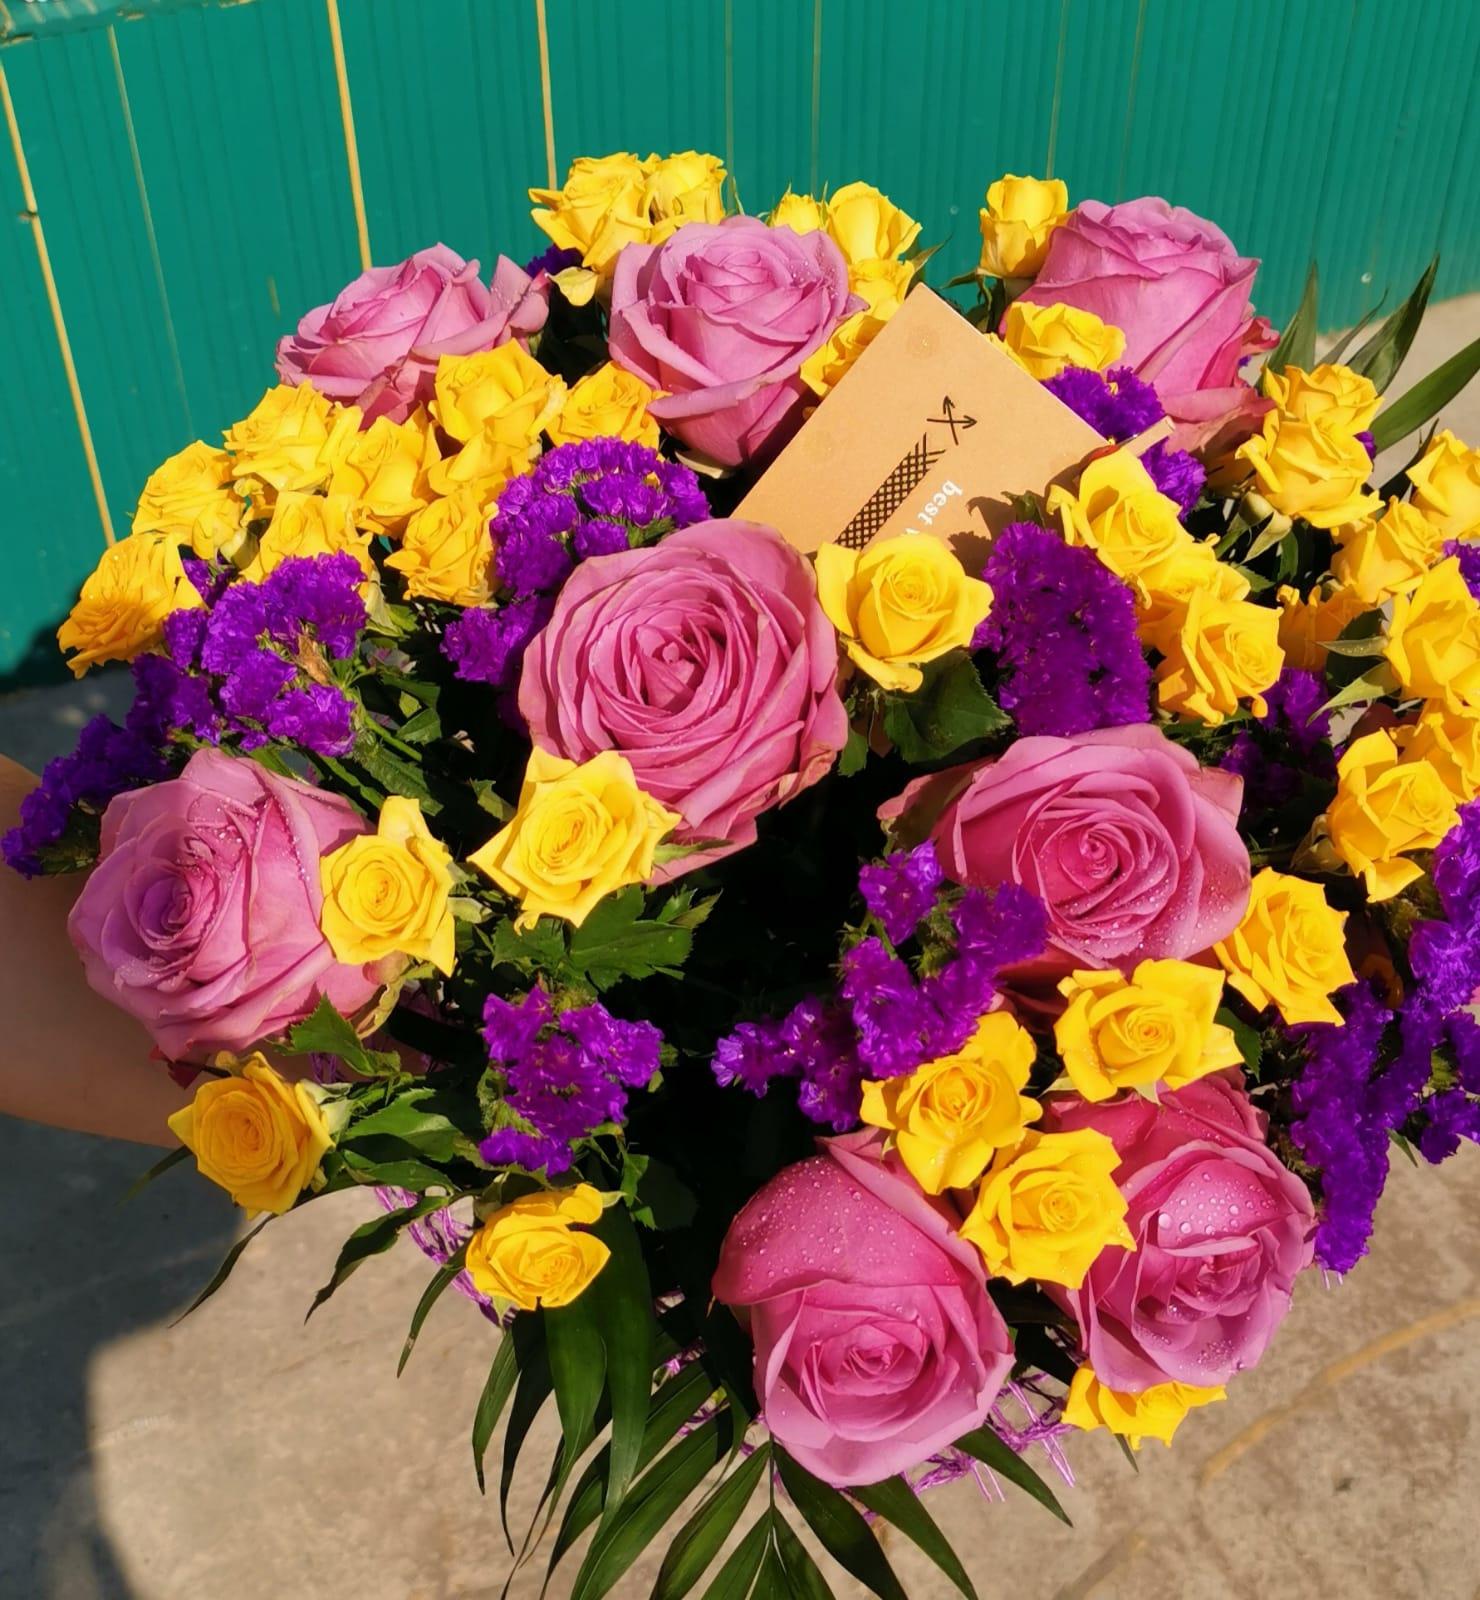 Buchet 9 trandafiri mov, 6 miniroza galbene, limonium preț 150 lei